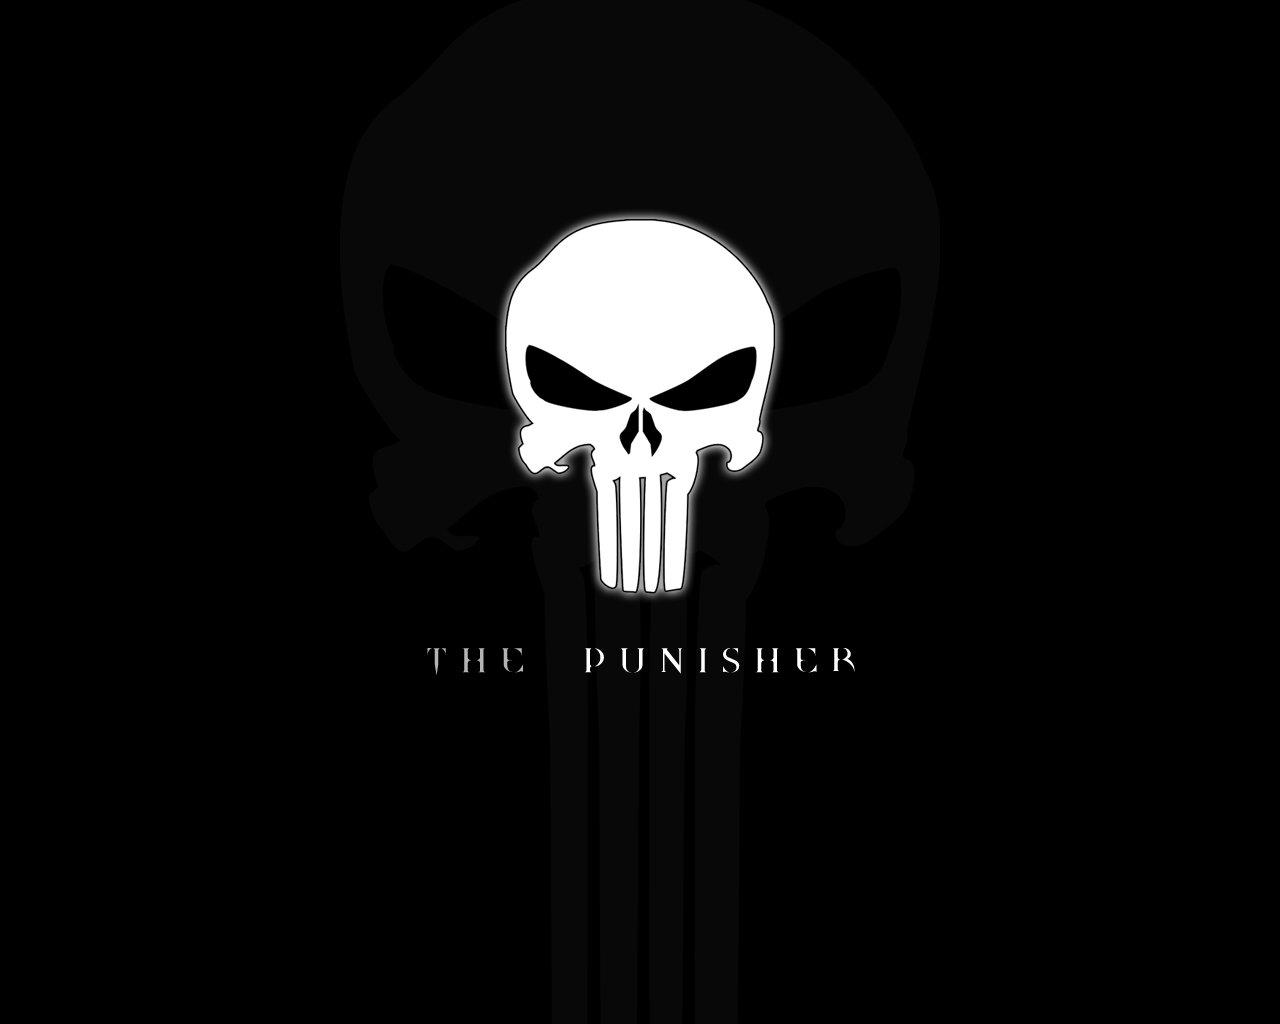 Source URL: http://www.smscs.com/photo/punisher_wallpaper_skull/3.html